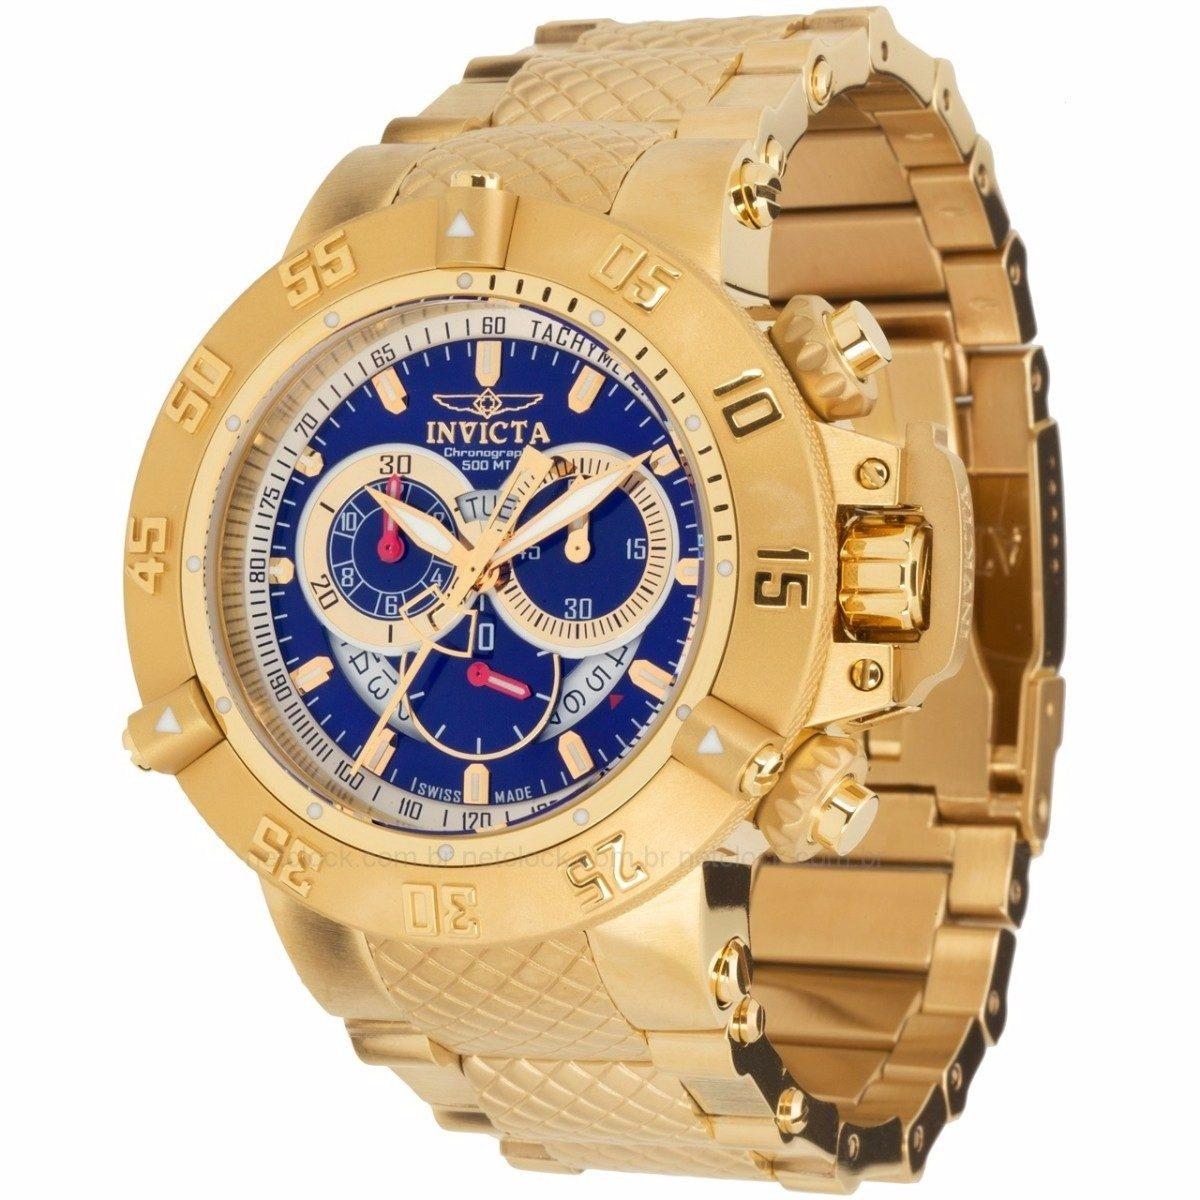 f331a671313 relógio invicta subaqua noma iii - 5404 dourado masculino. Carregando zoom.